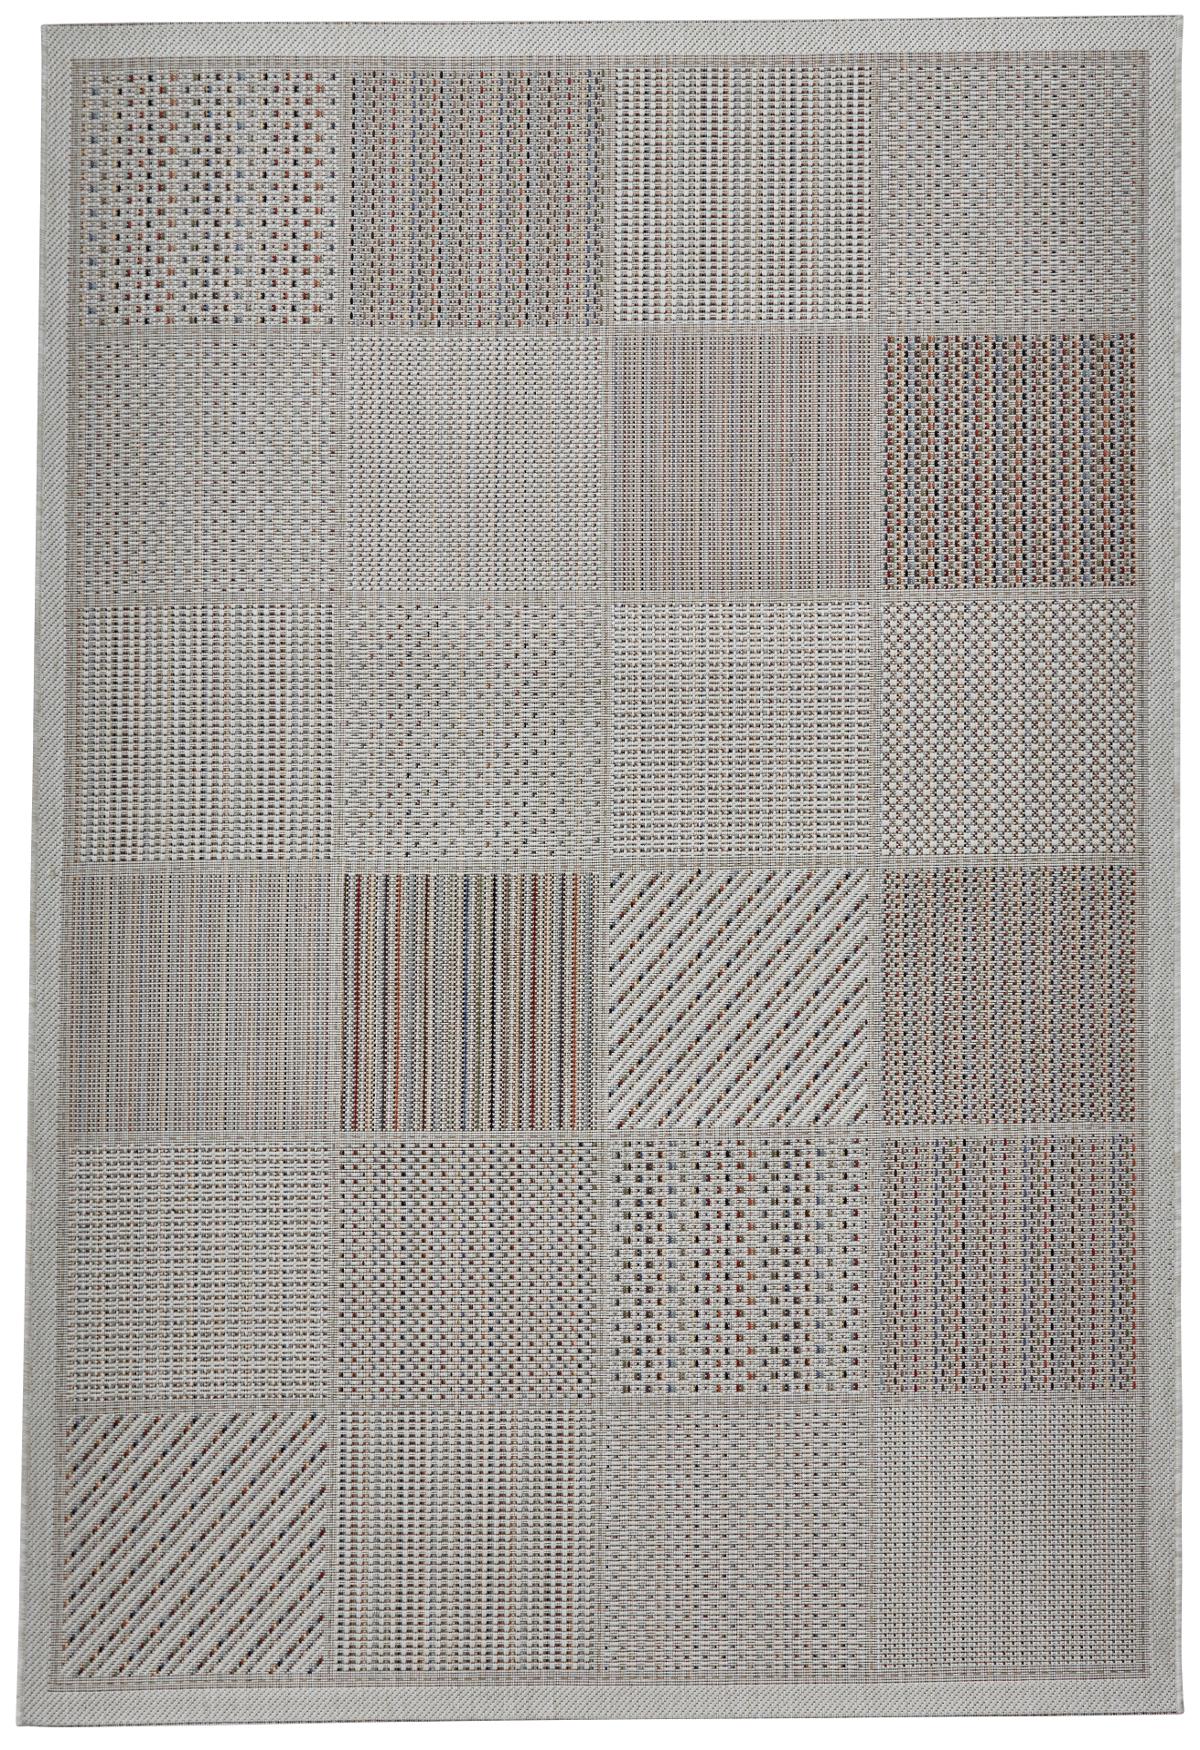 Neutral Vegas Rug Durable Flat Weave Polypropylene Floor